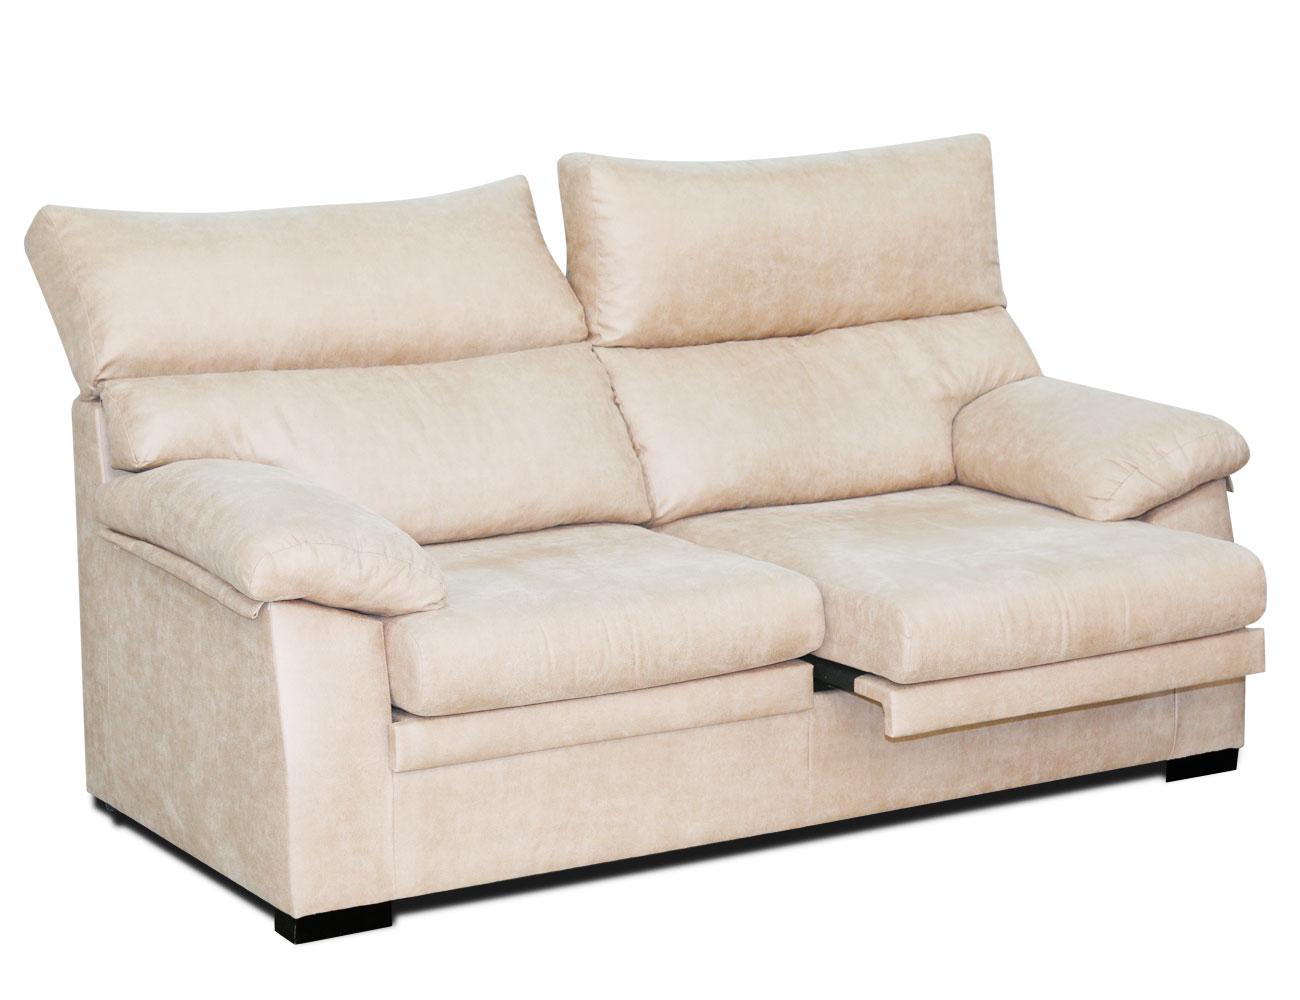 Sofa 3 plazas extraible surf blanco 1